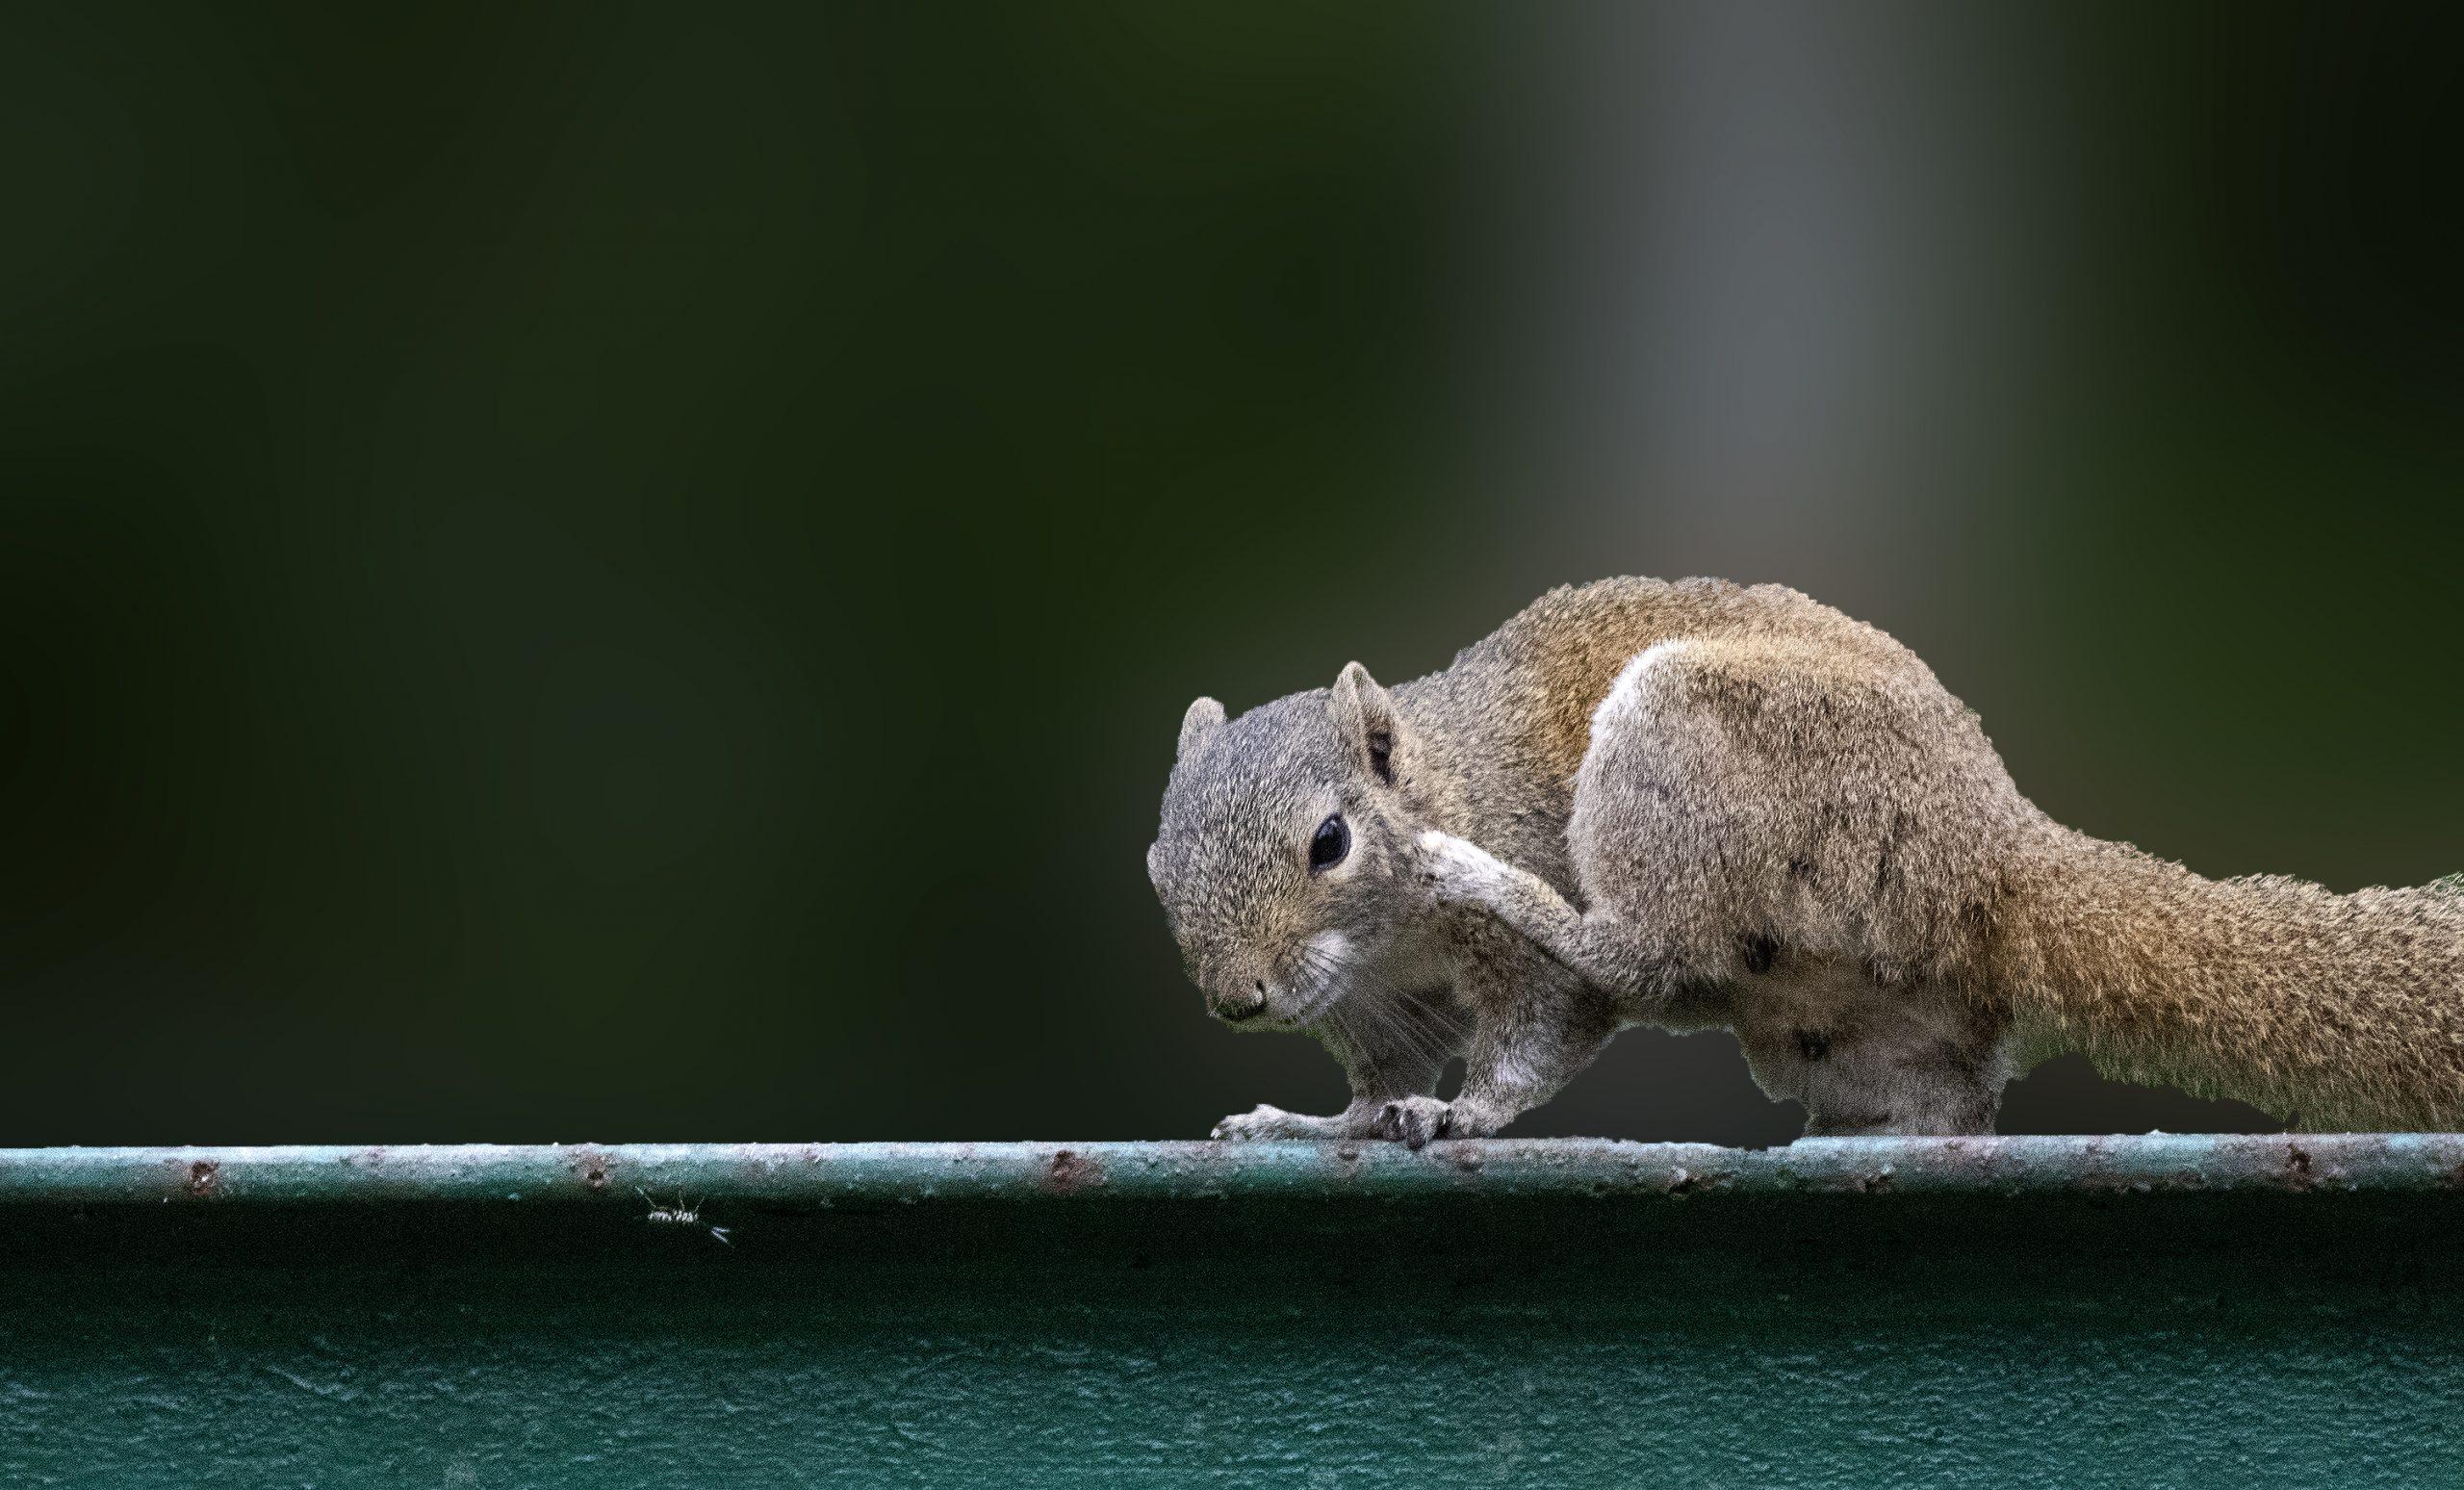 Squirrel on a metallic rod